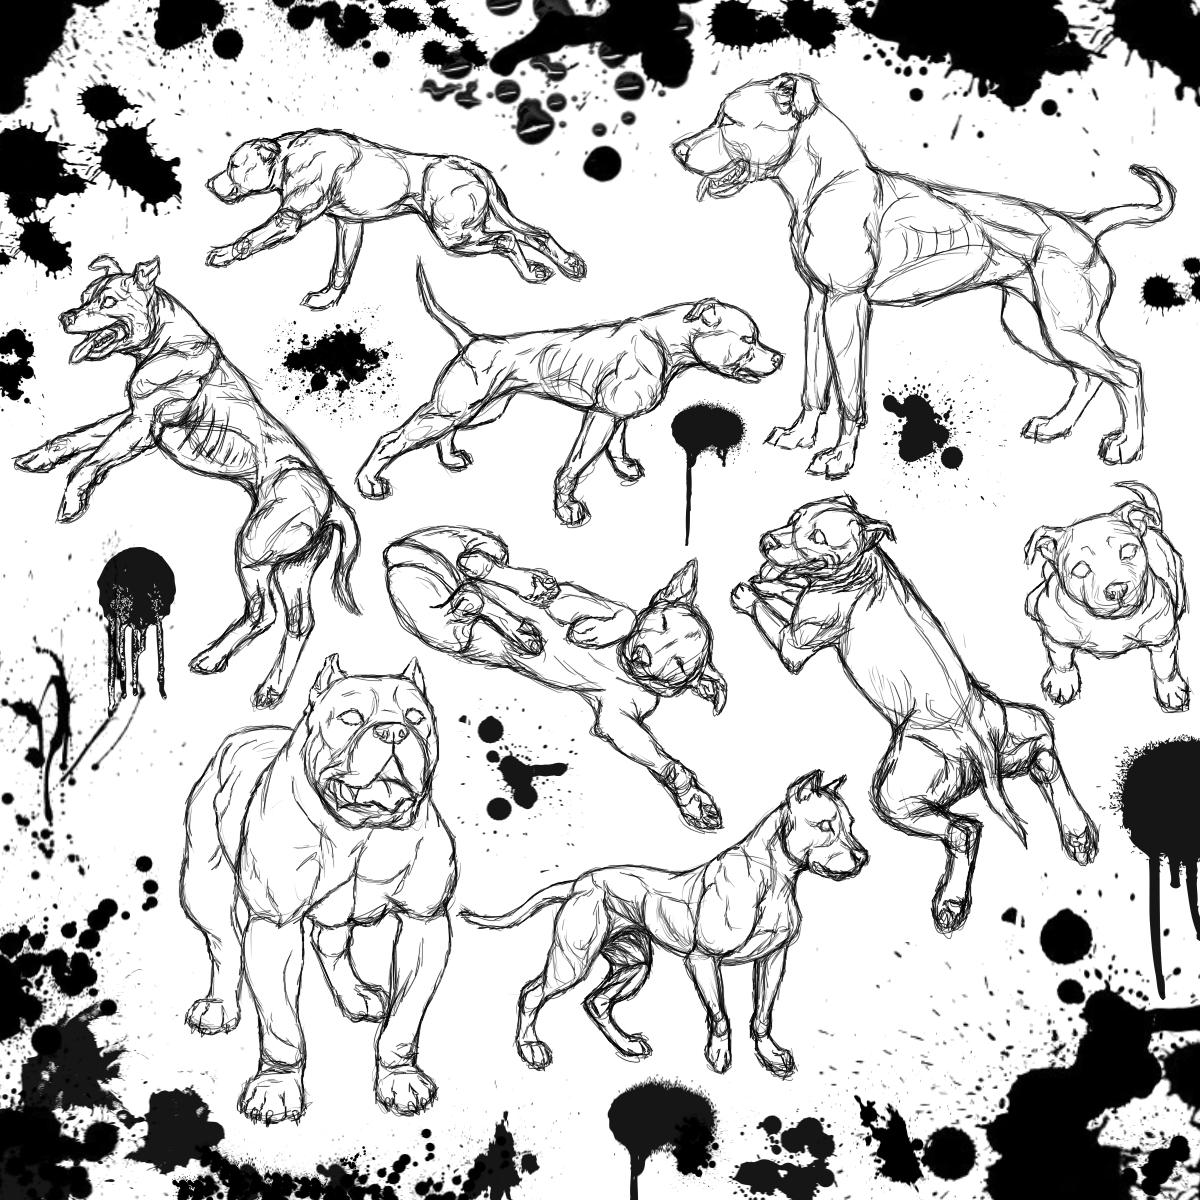 1200x1200 Pit Bull Sketch Dump By Eternusnexxx